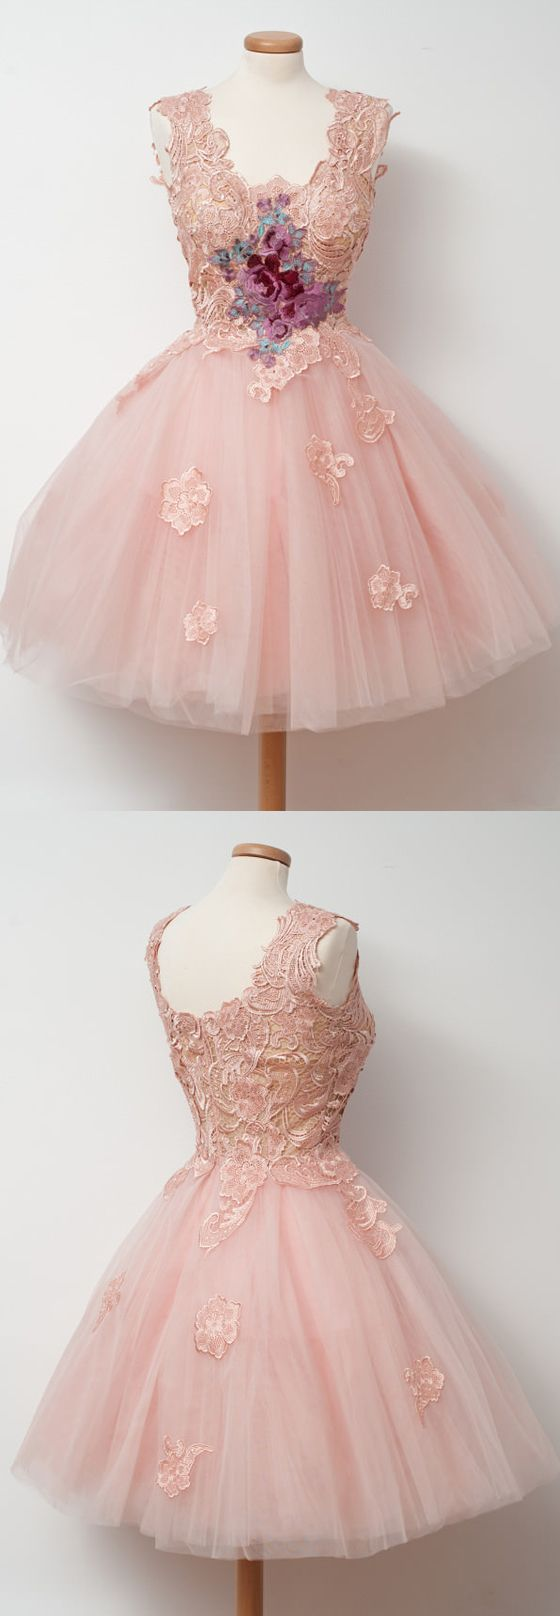 Cute Pink Unique Lace Junior Beautiful Cheap Short Homecoming Dresses, WG808